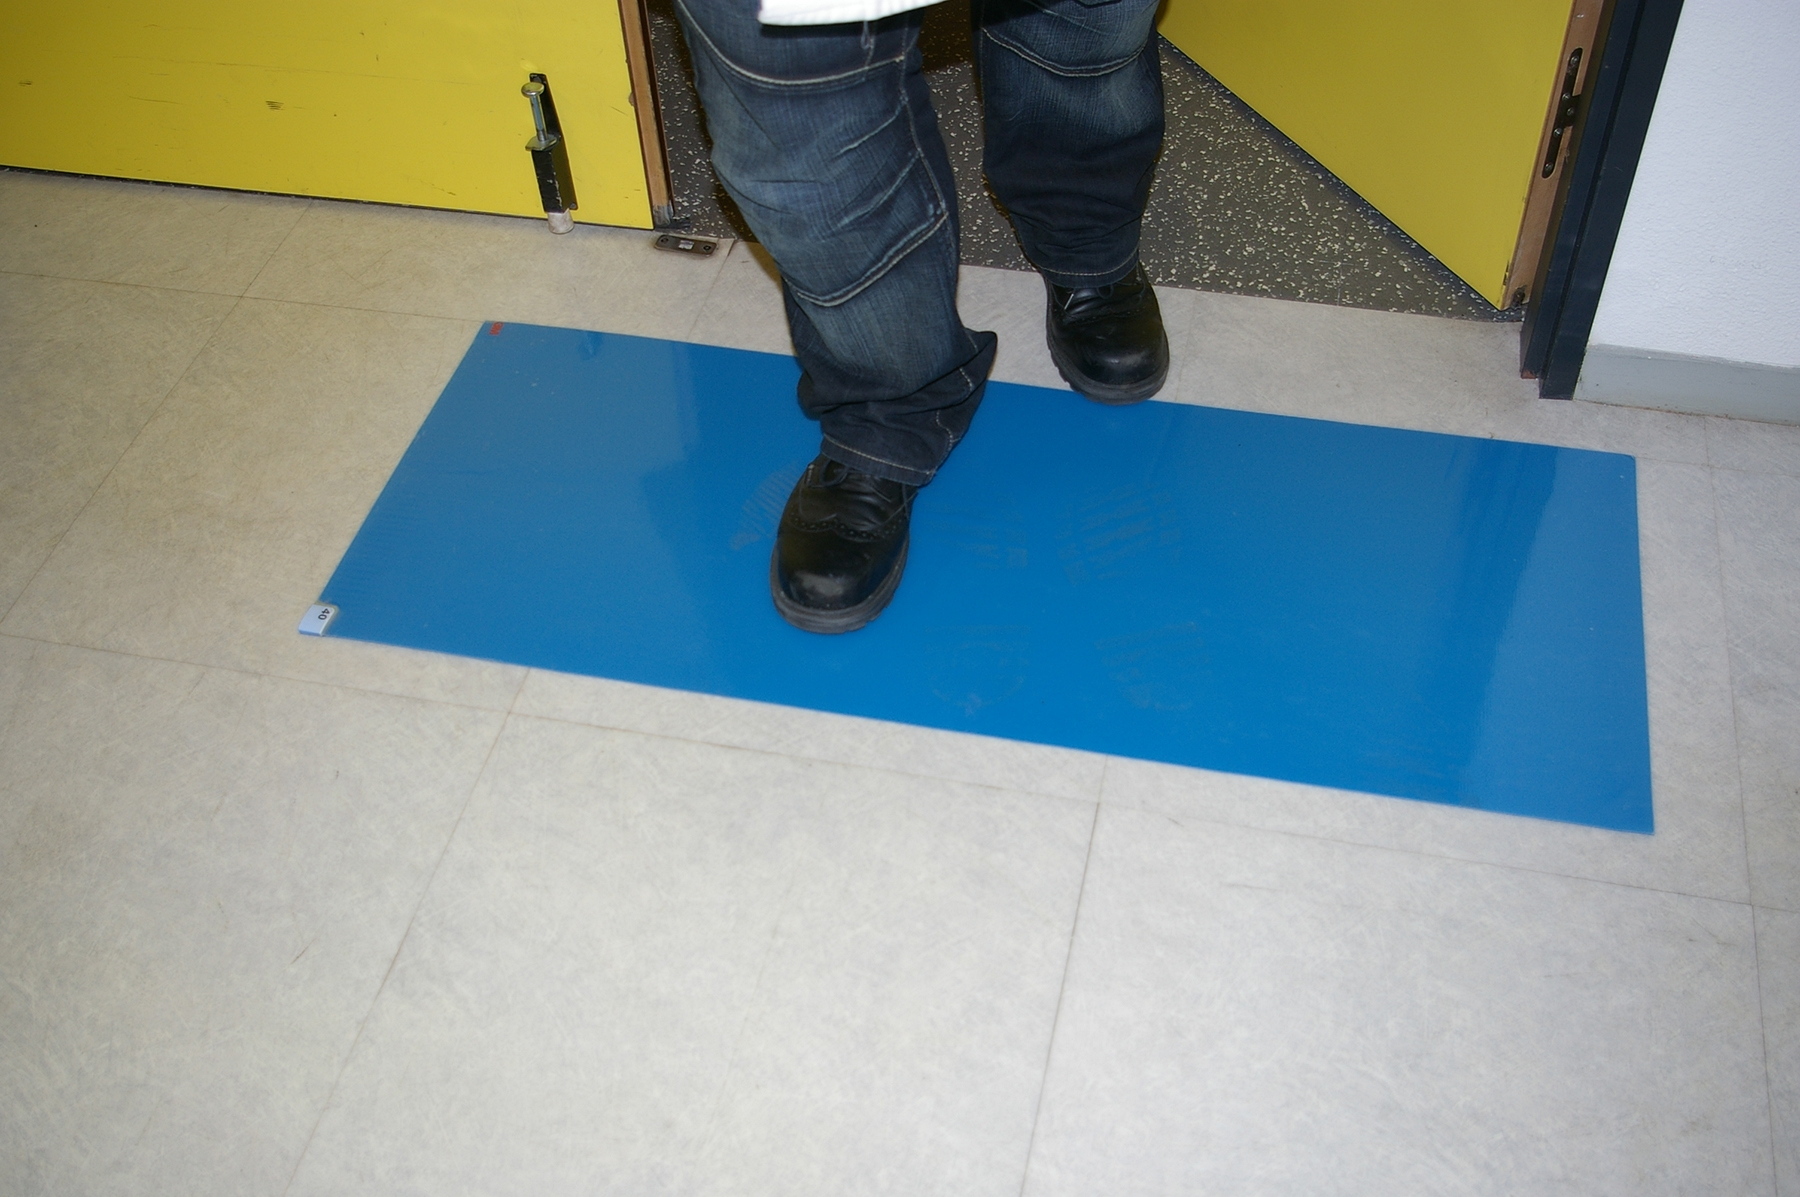 3m Ultra Peelable Carpet Cleanliness Carton 6 115x45 Blue Carpet